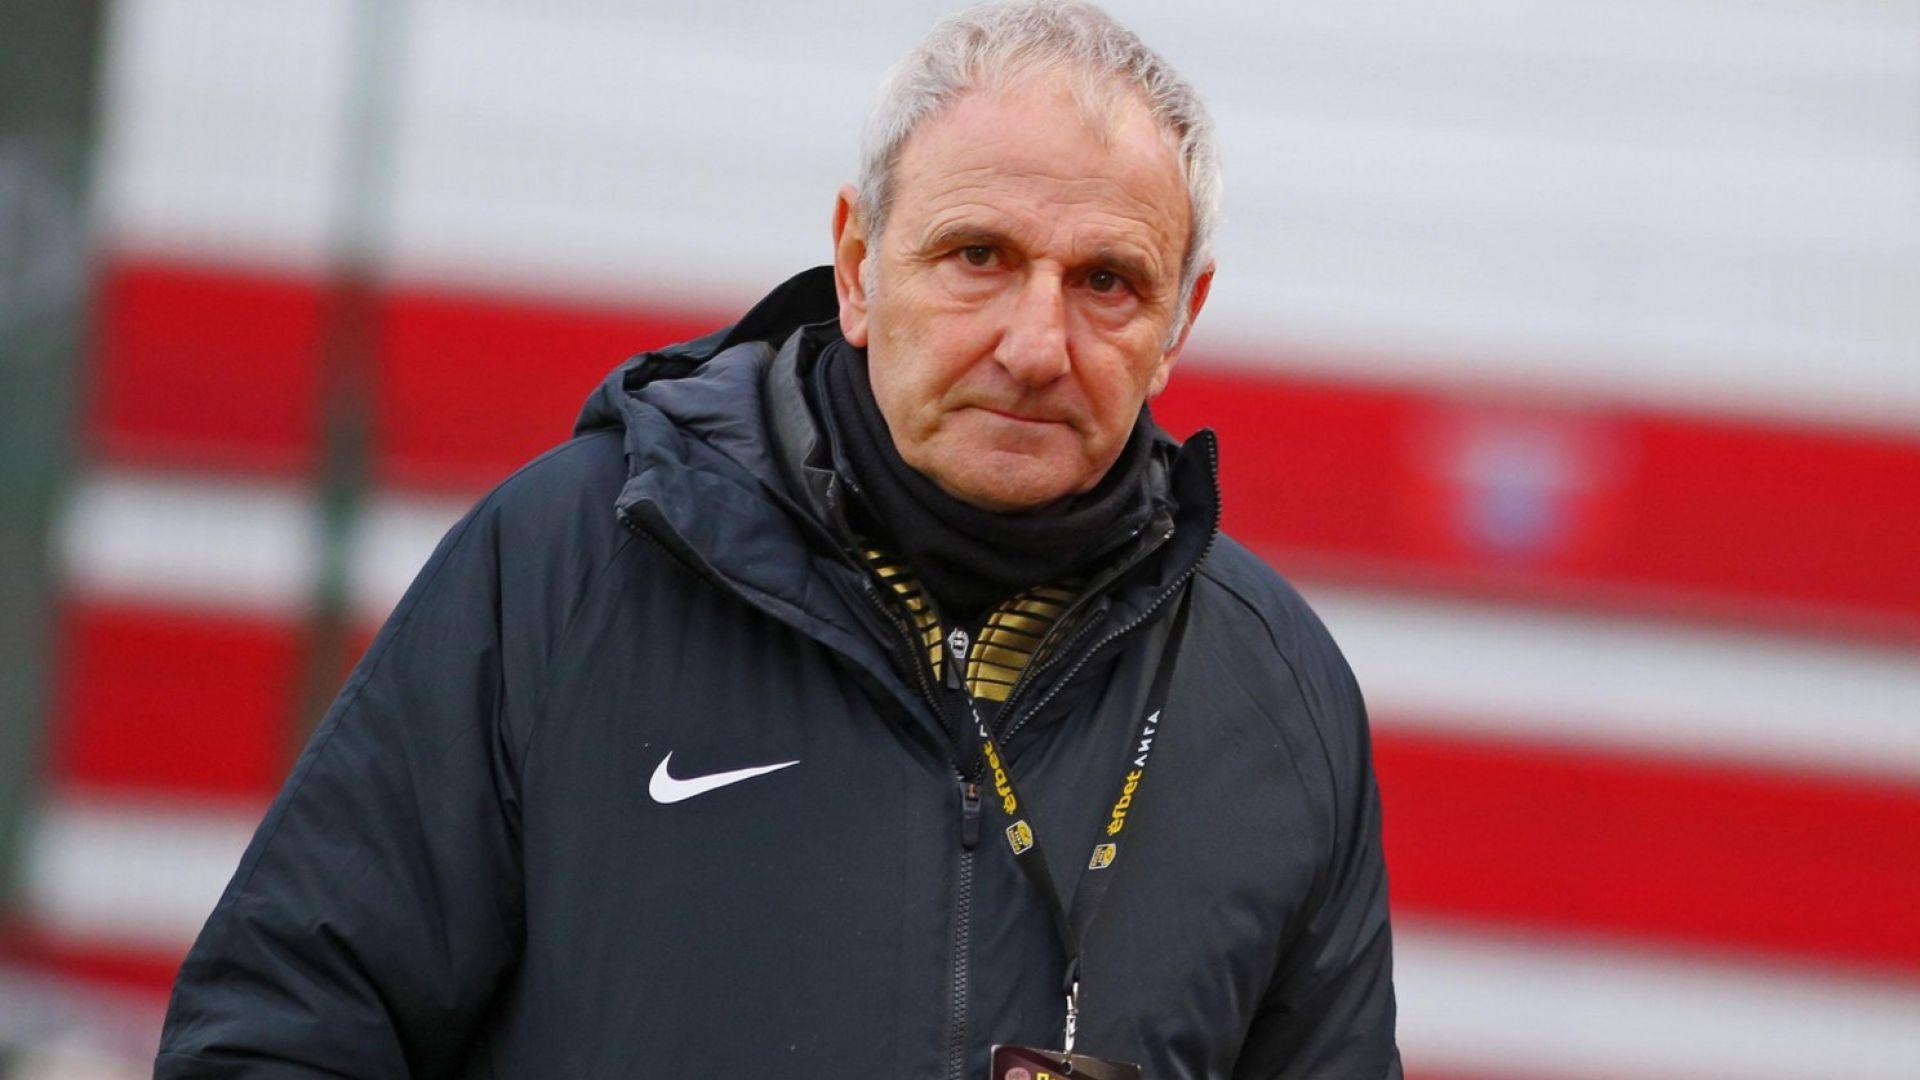 Трагедия - коронавирусът погуби футболния треньор Никола Спасов